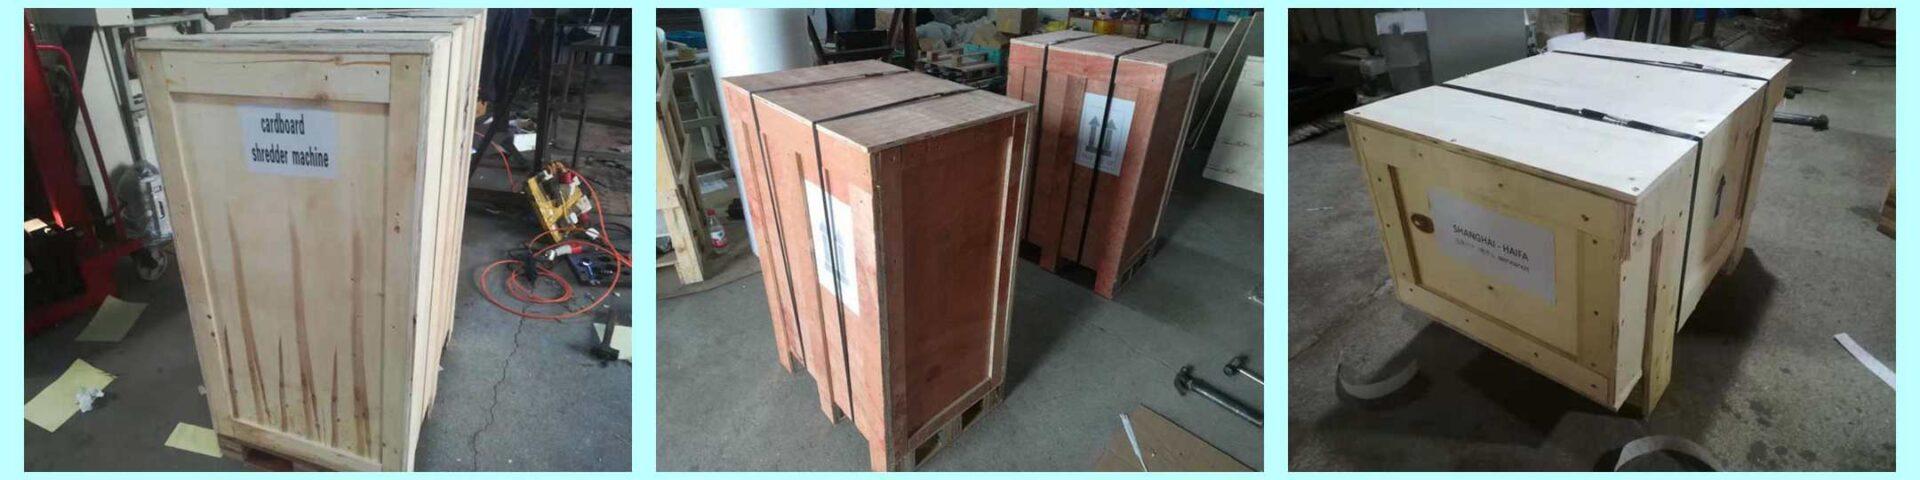 Packaging&Shipment